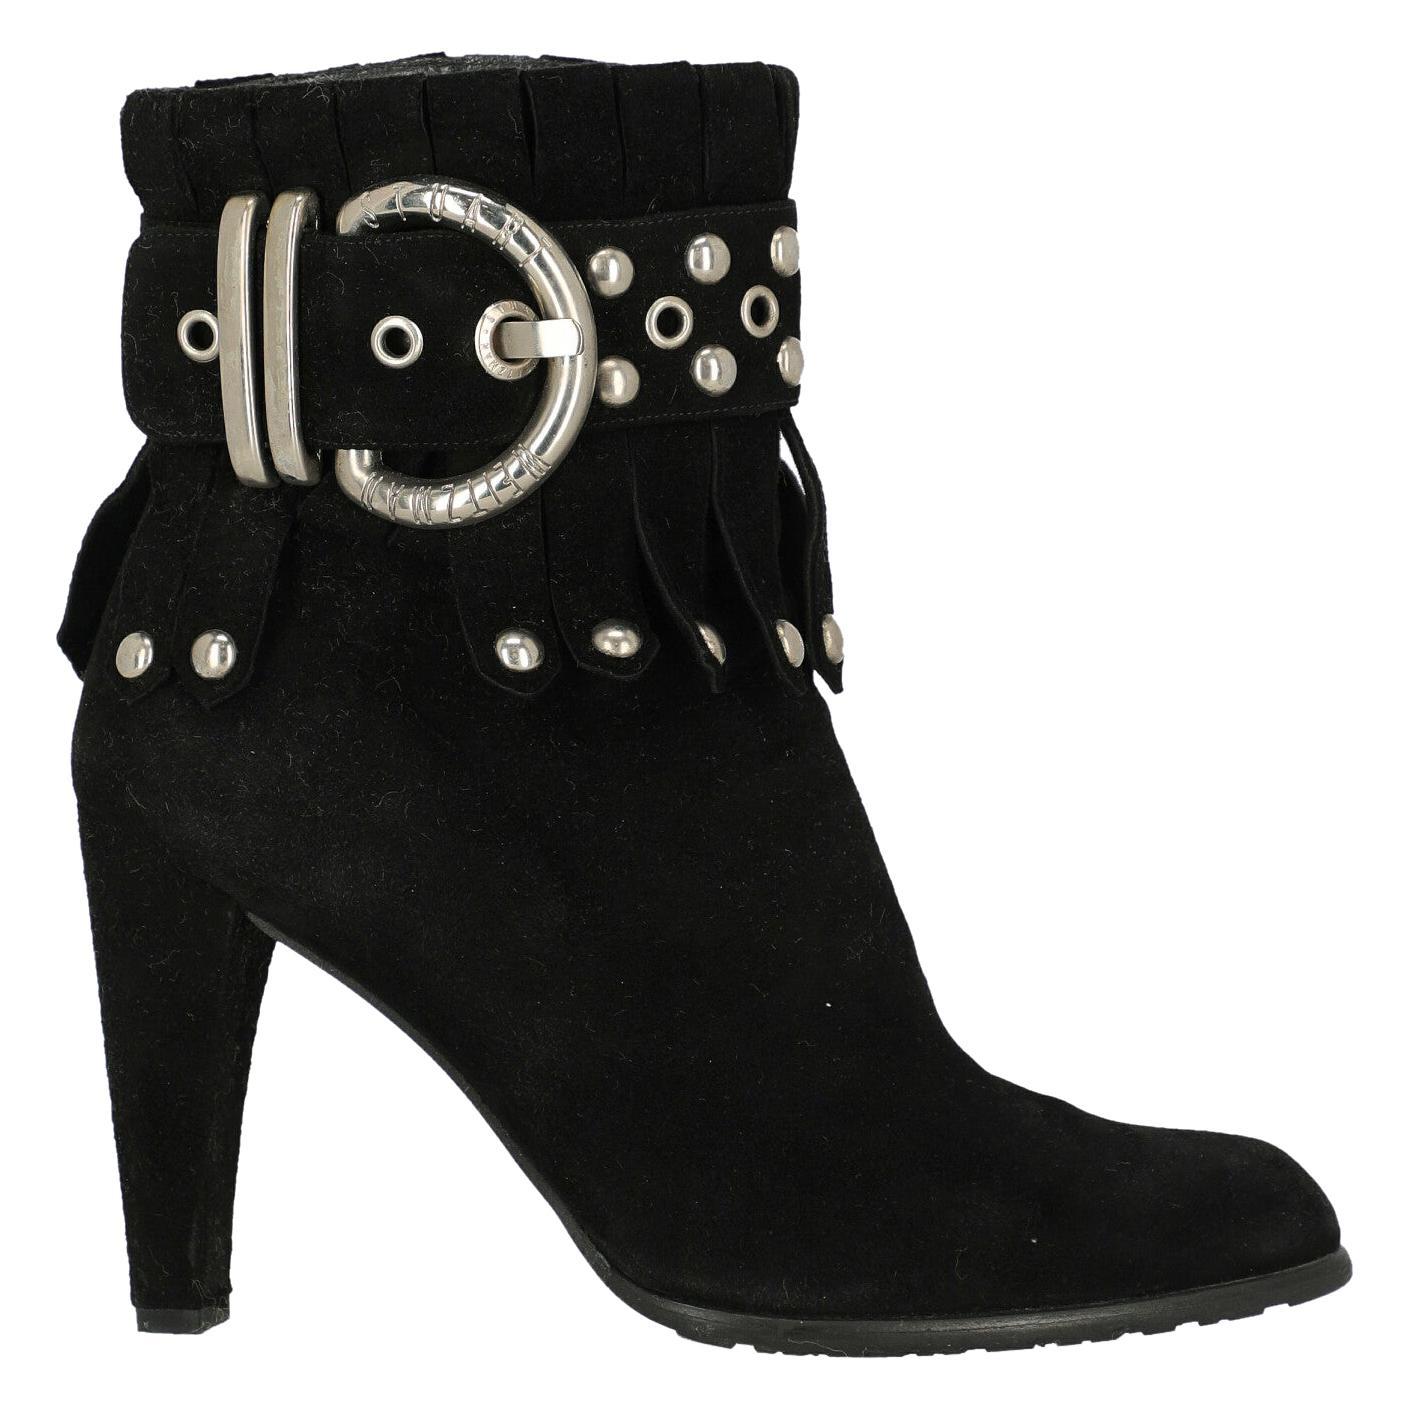 Stuart Weitzman Woman Ankle boots Black Leather IT 37.5